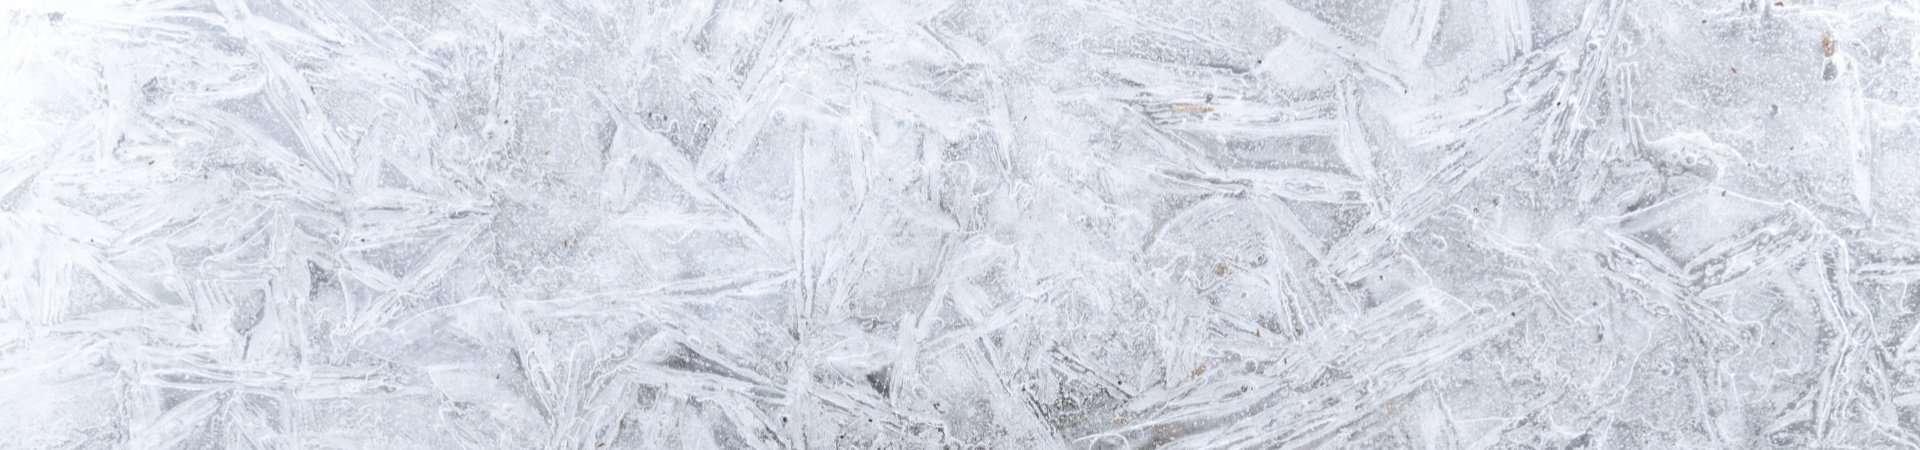 Caring for Winter Skin   Caring for Dry Skin   #dryskin #winter